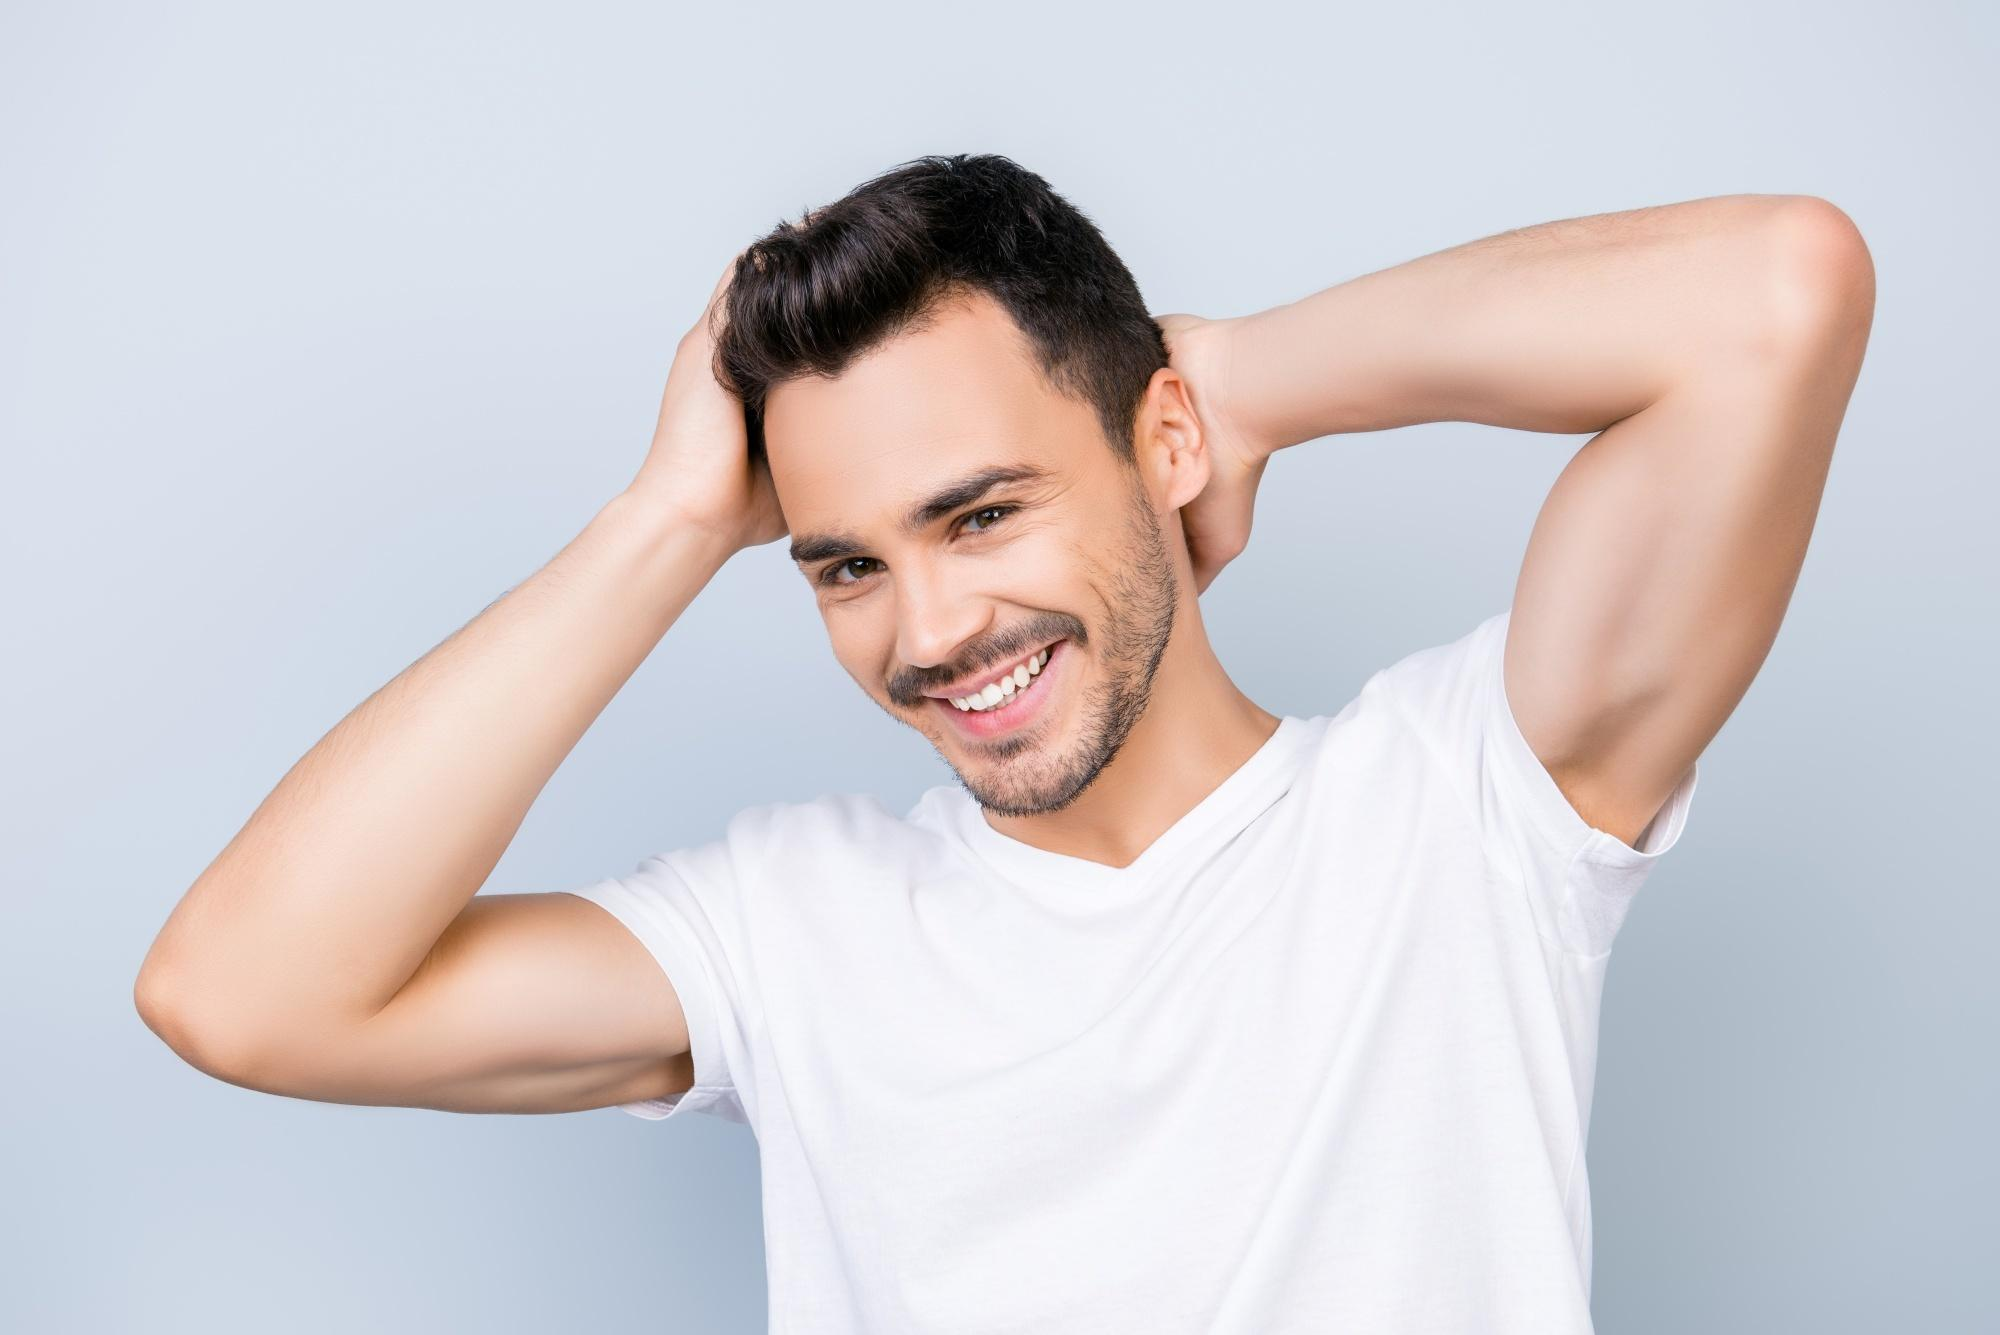 Man wearing a white shirt stroking his dark hair and smiling